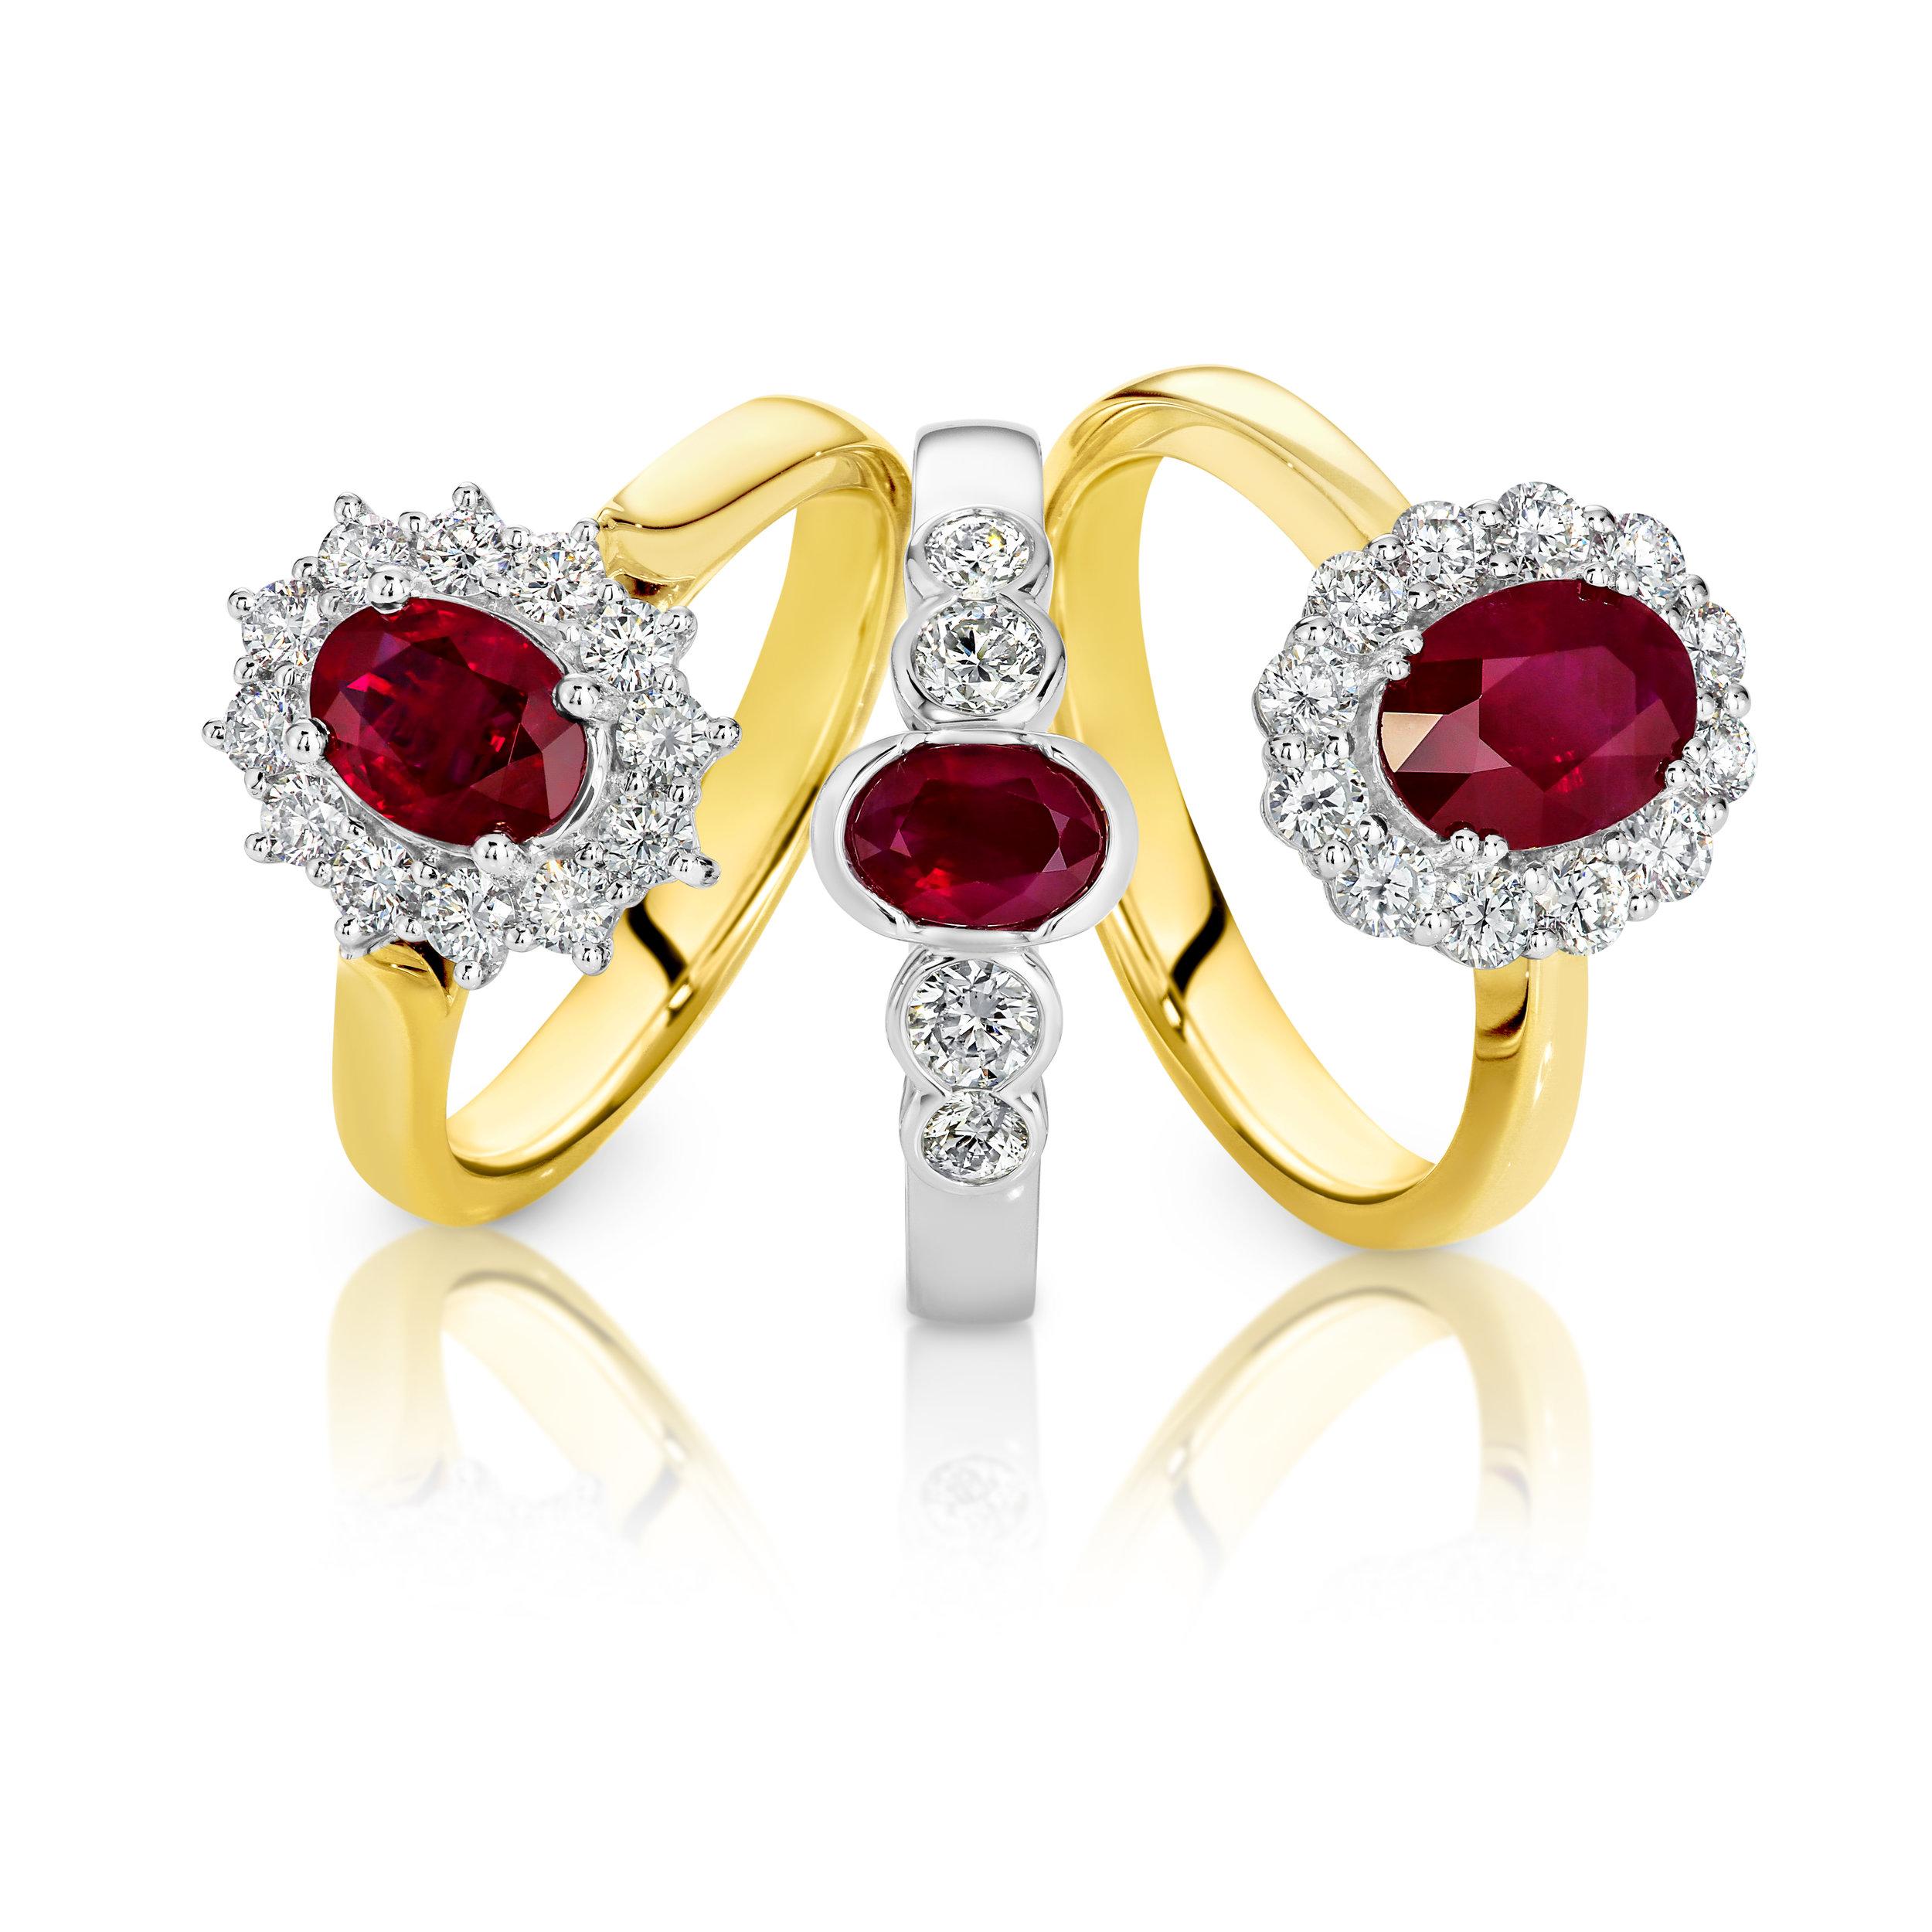 bigstock-Jewelry-Earring-Isolated-On-Th-36349741.jpg